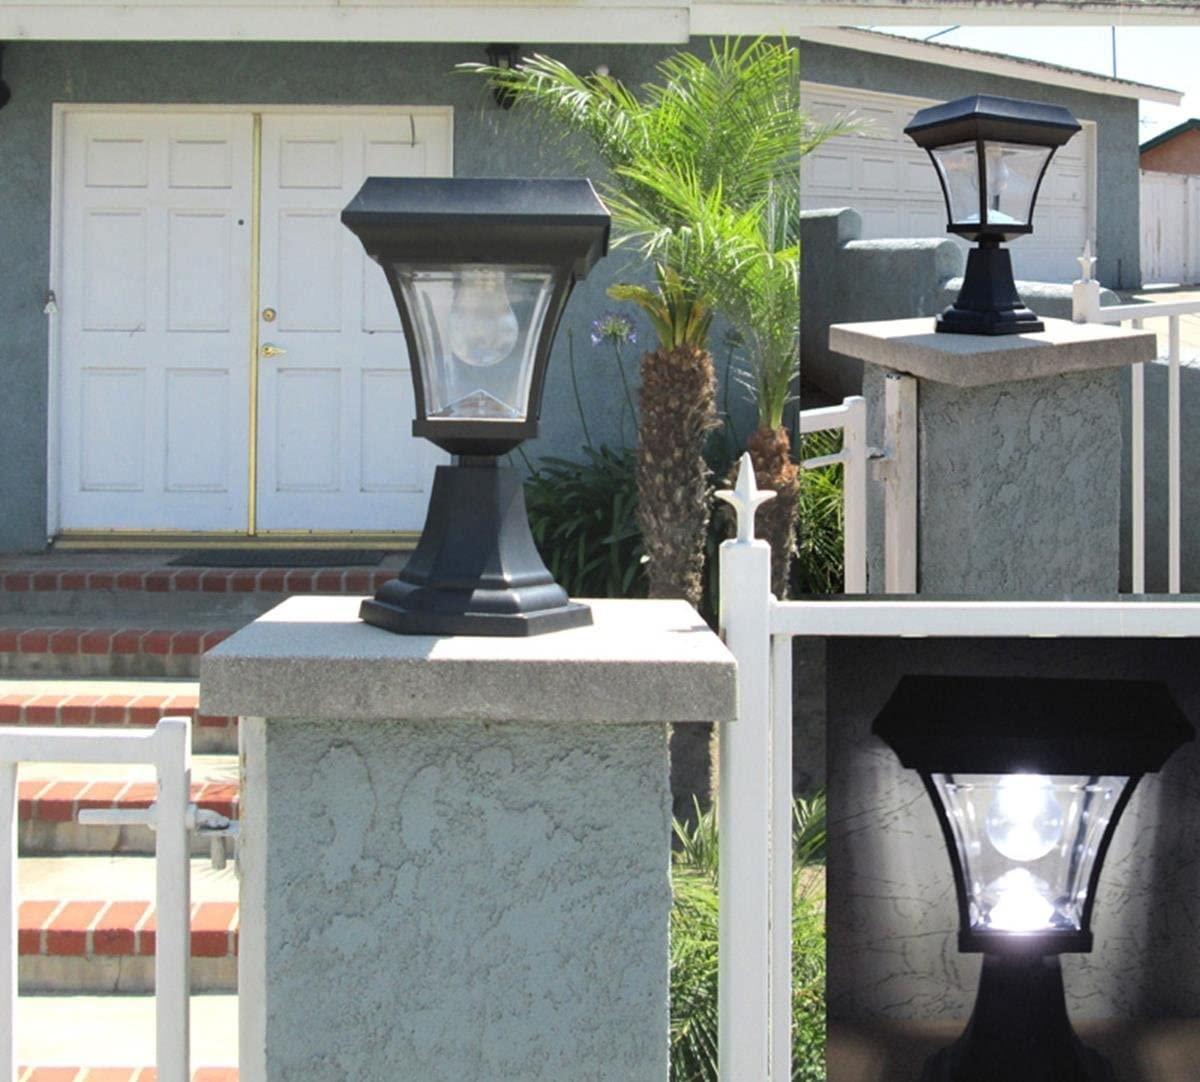 GSL SS-GSL-PLD205 Ultra Bright 4 LEDs Solar Fence Gate Lamp Post